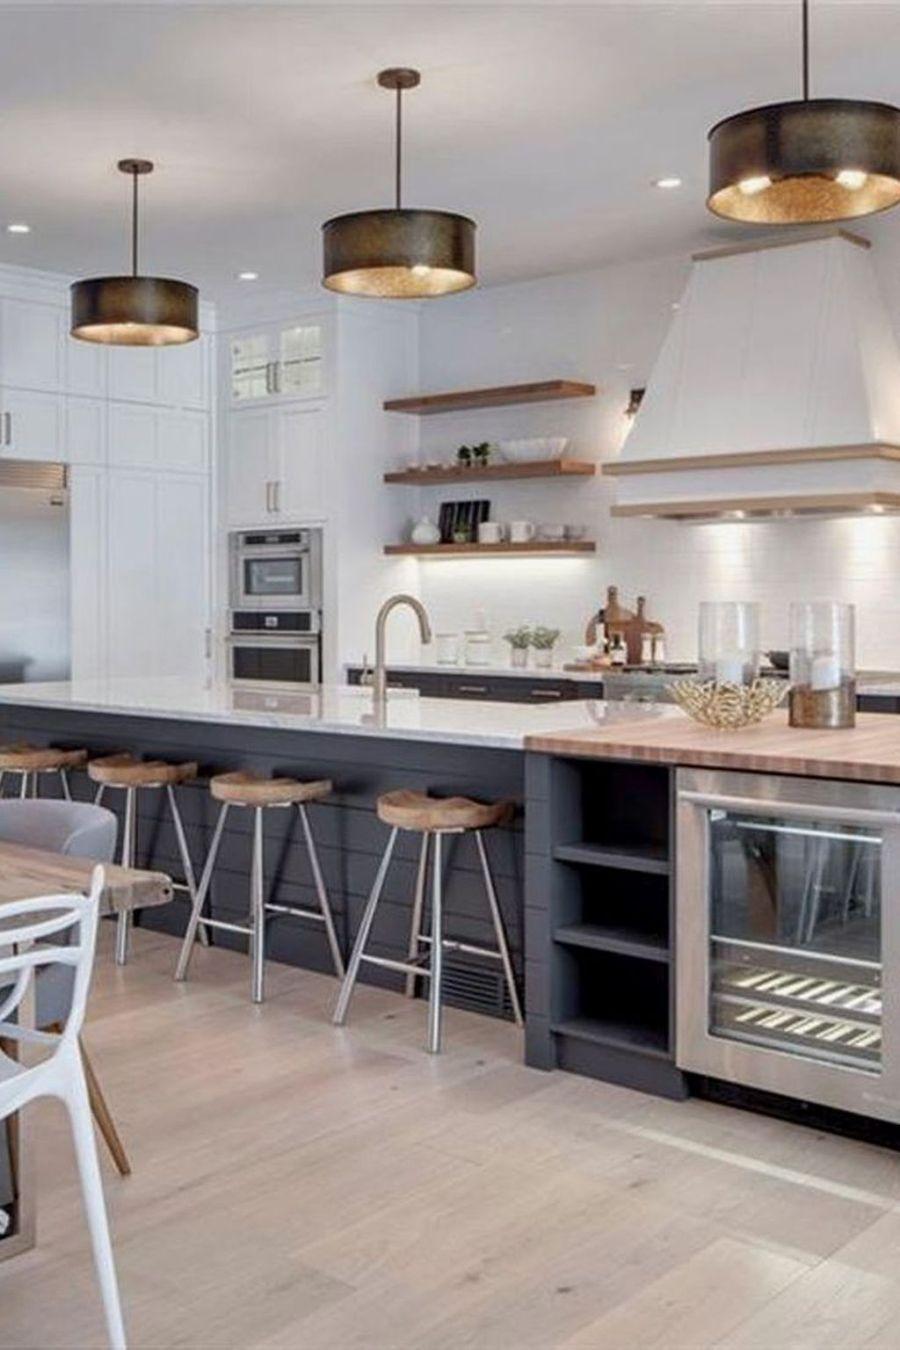 10 Awesome Kitchen Organization Layout Project In 2020 Modern Farmhouse Kitchens Modern Kitchen Design Farmhouse Kitchen Design